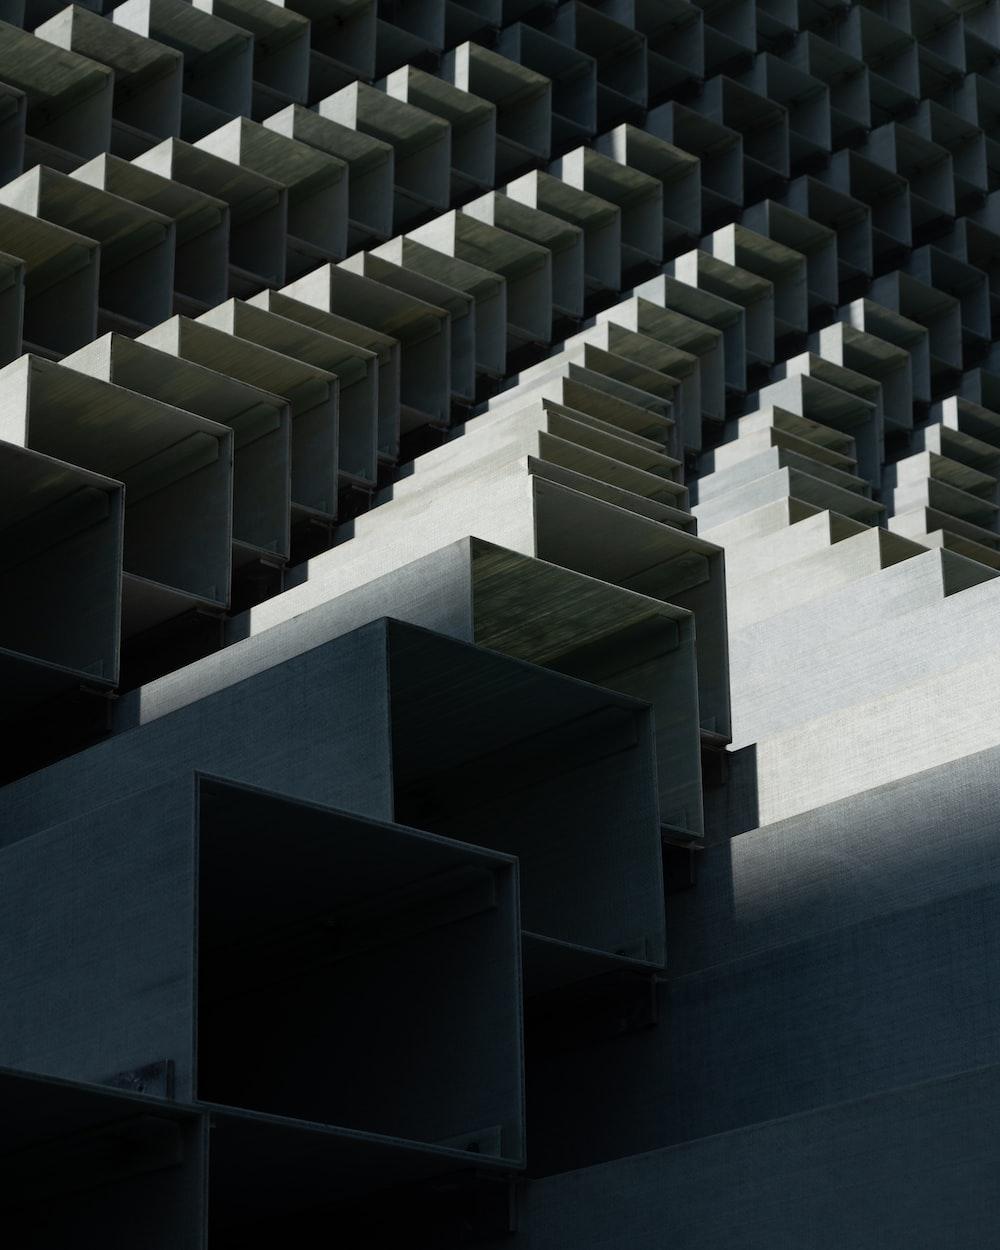 gray cube abstract wallpaper vector art